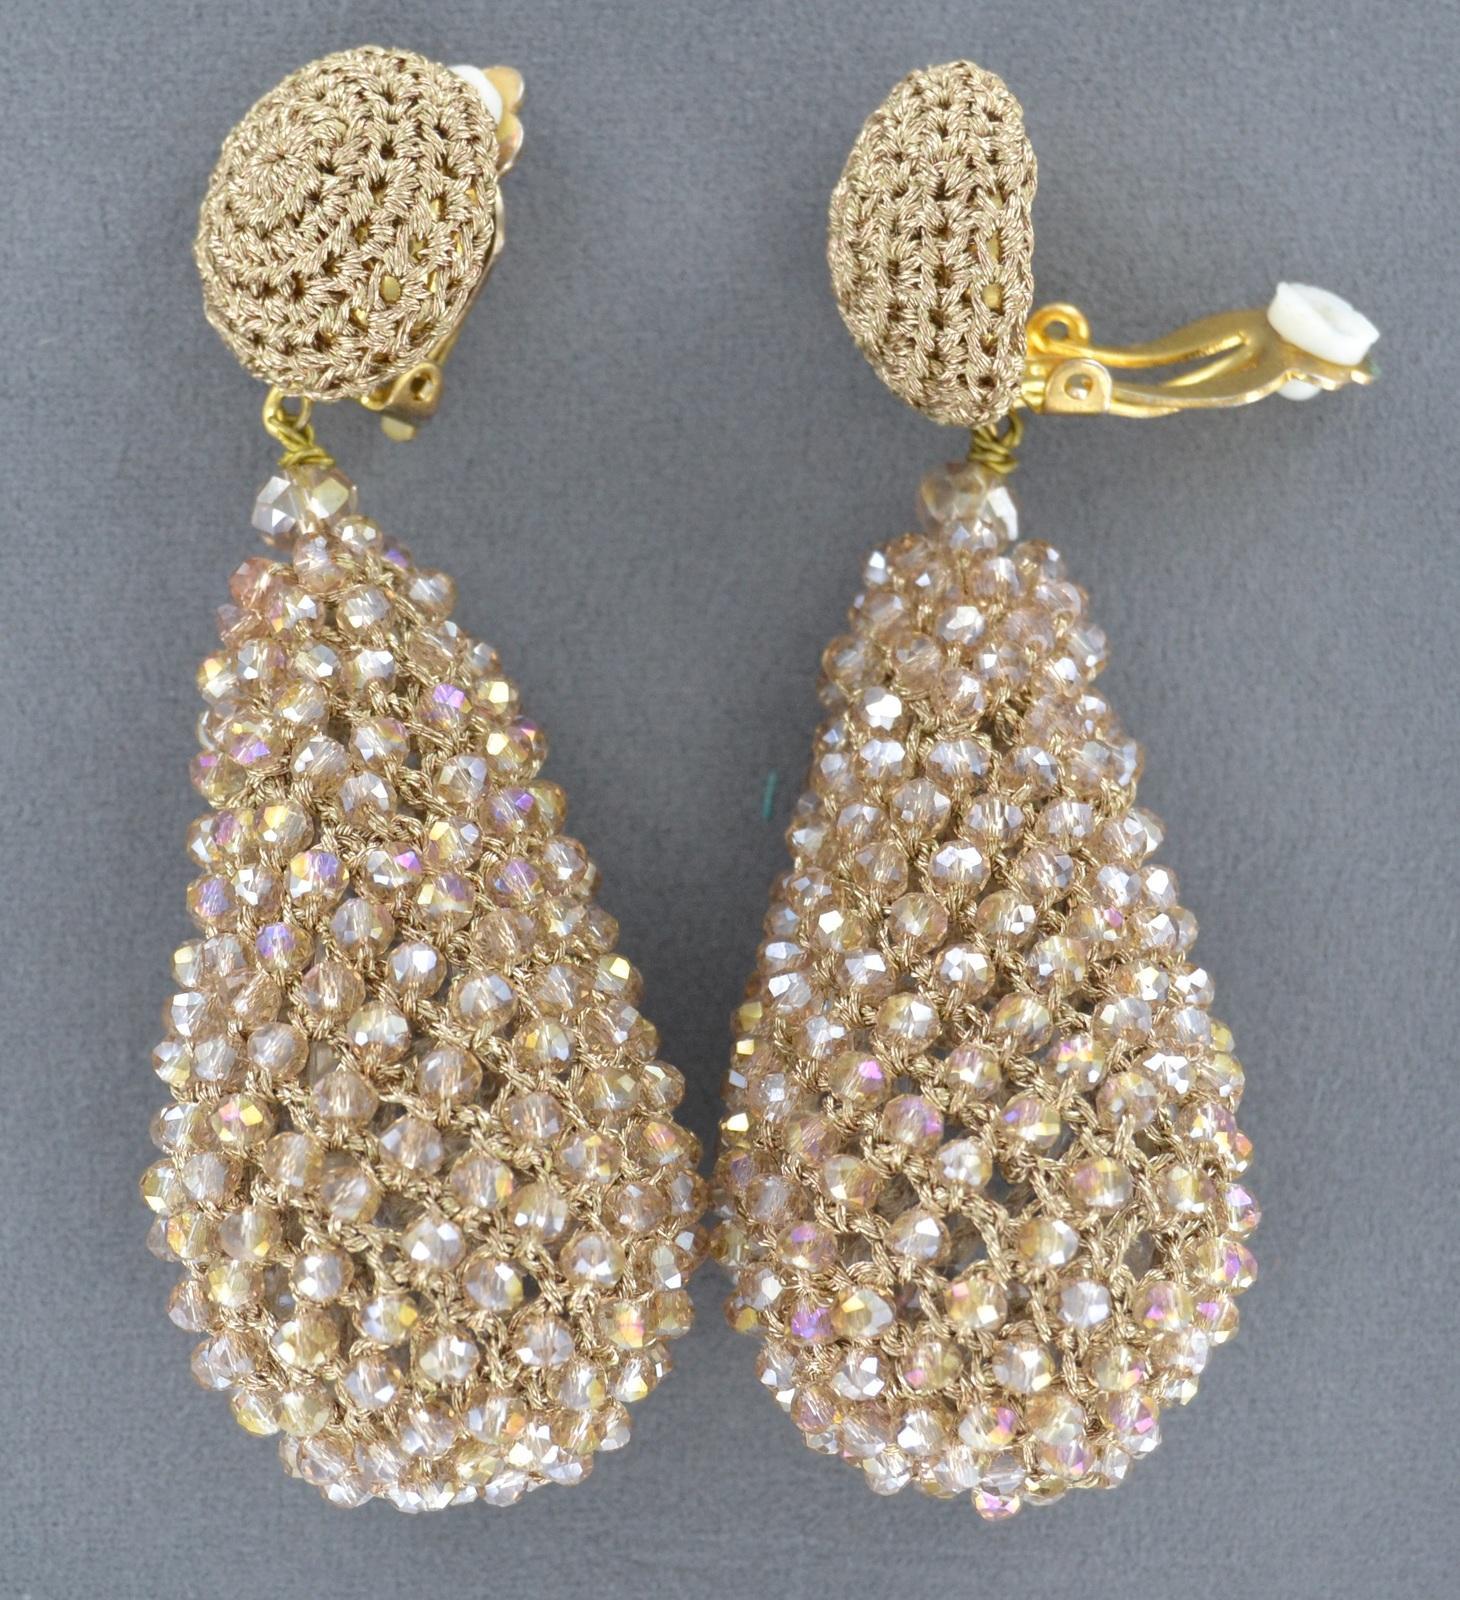 Image of Ohrringe Filini Drop Gold